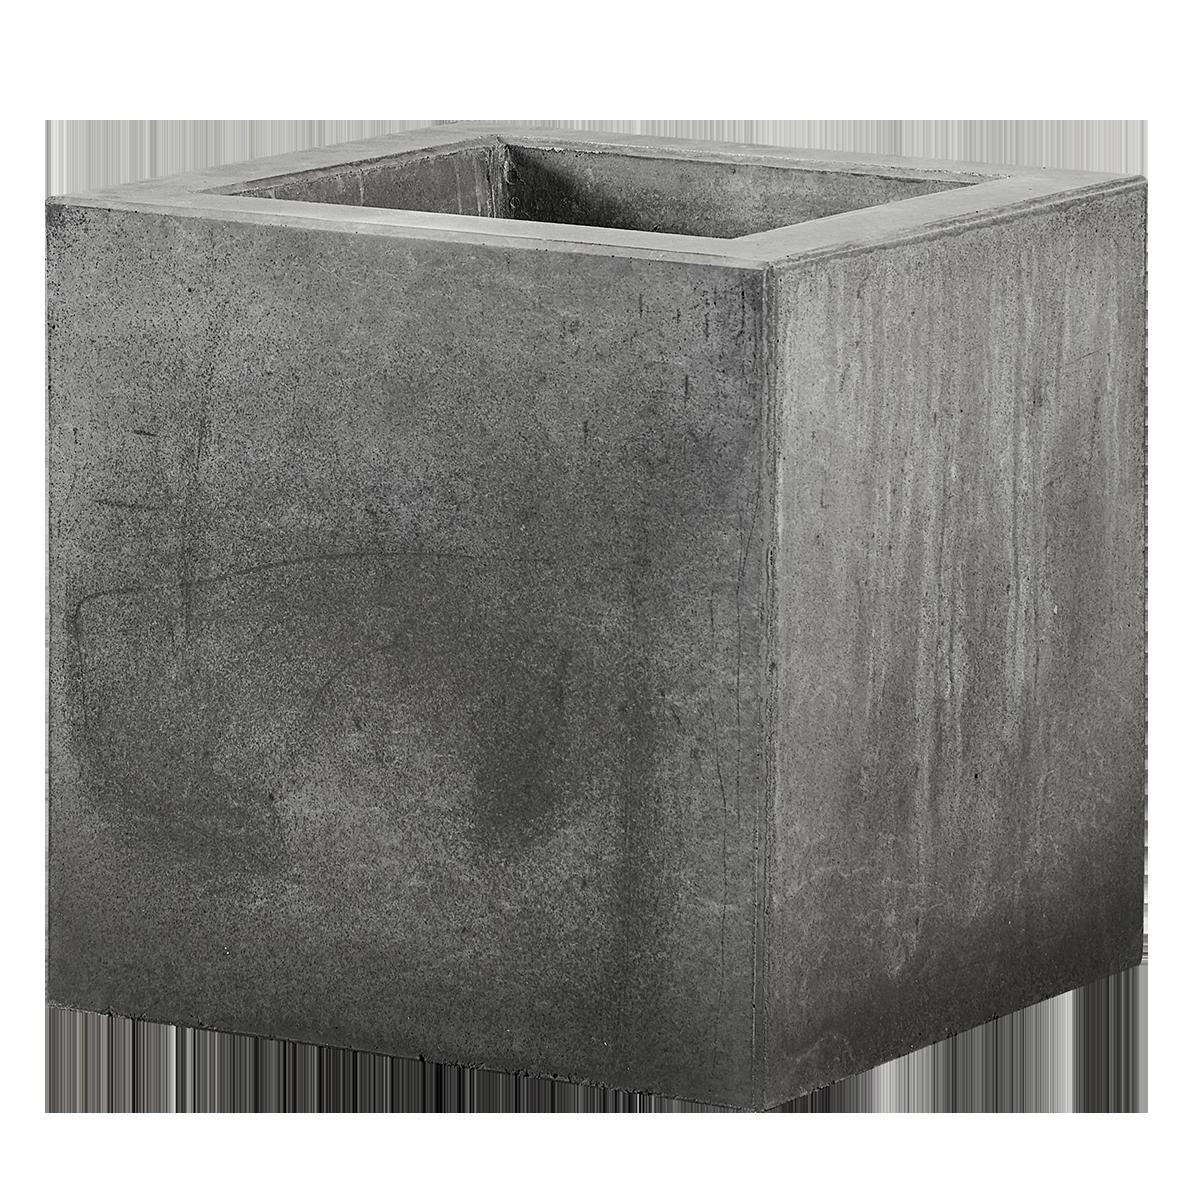 Plantekummer Nordicserien 50x50x50 cm Sort/Antracit m/bund